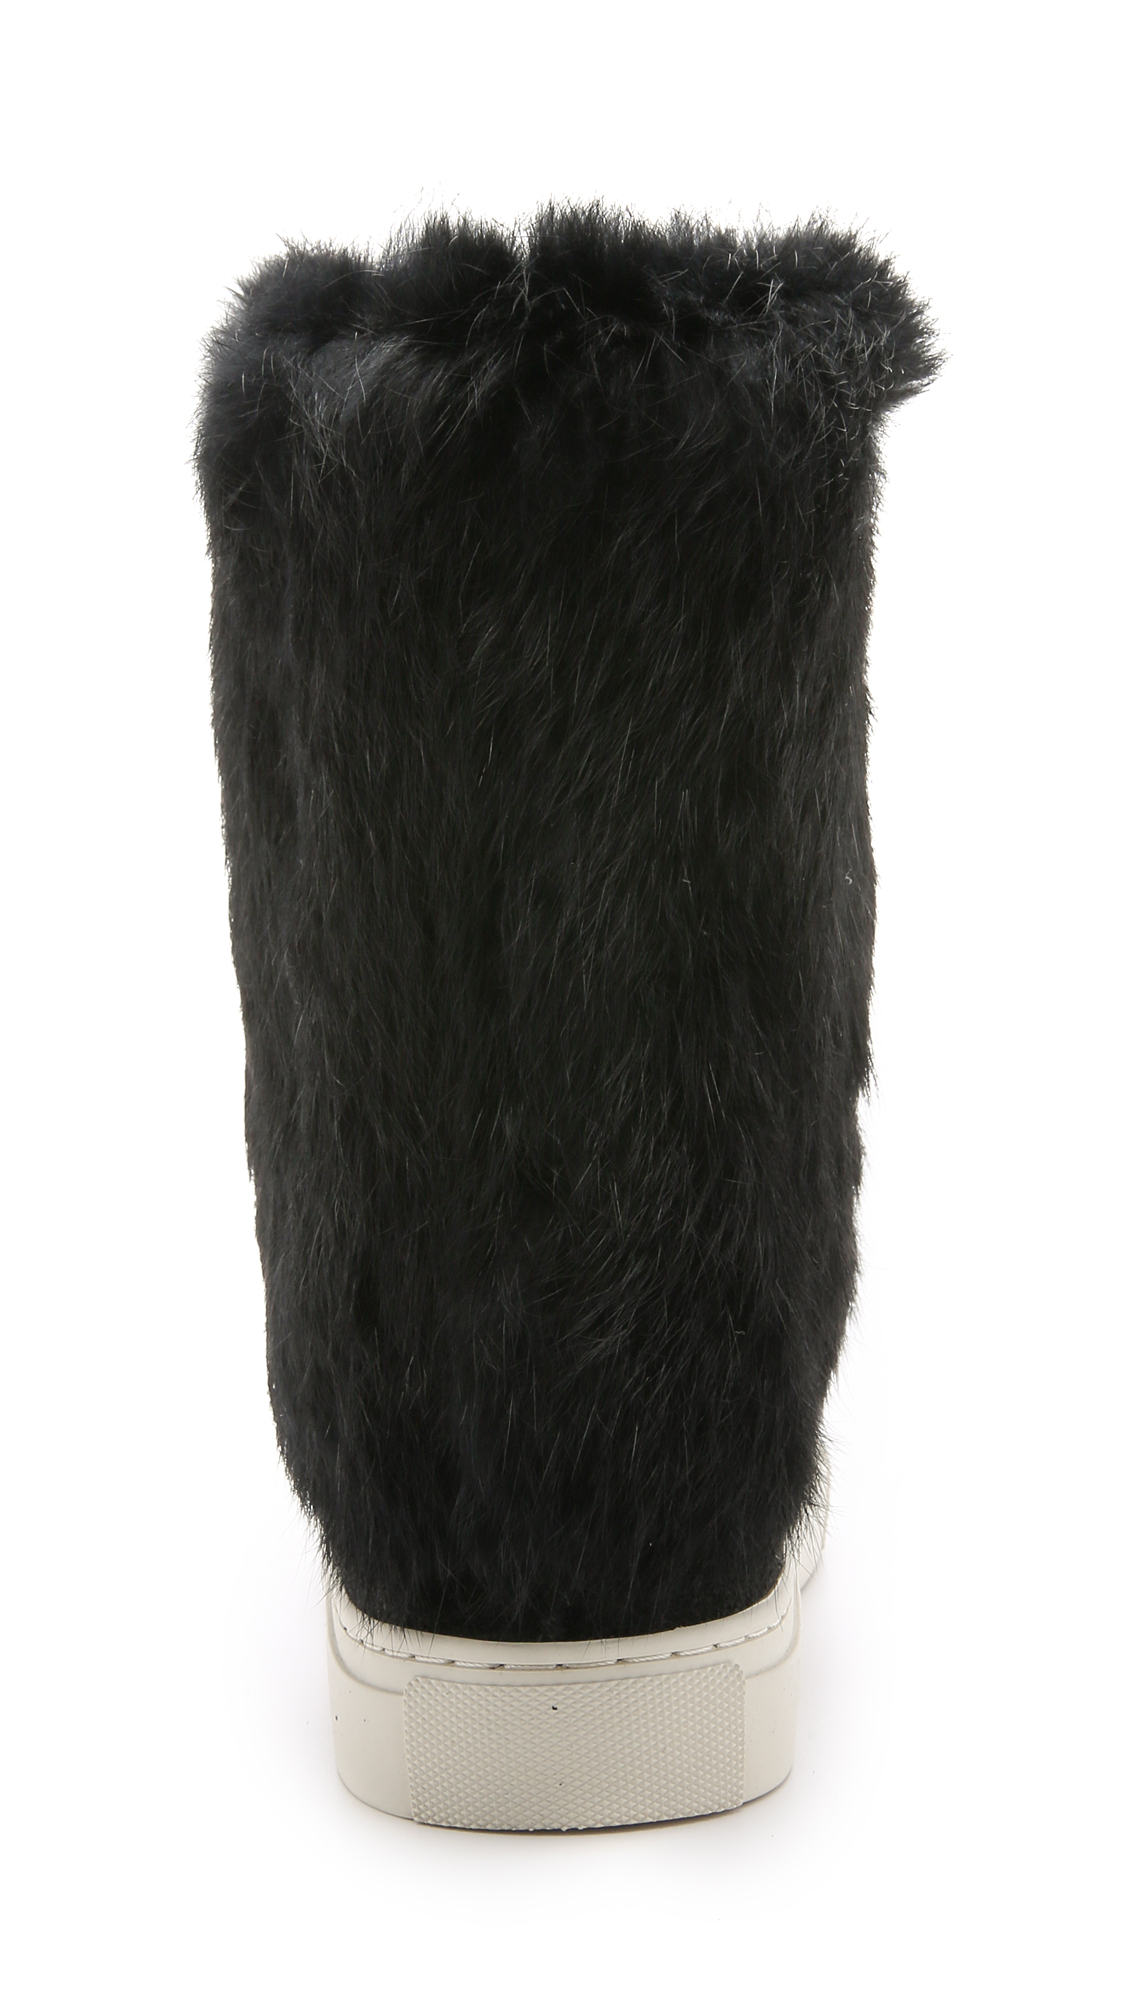 8769a2cf72c6 Tory Burch Anjelica Suede Fur Boots